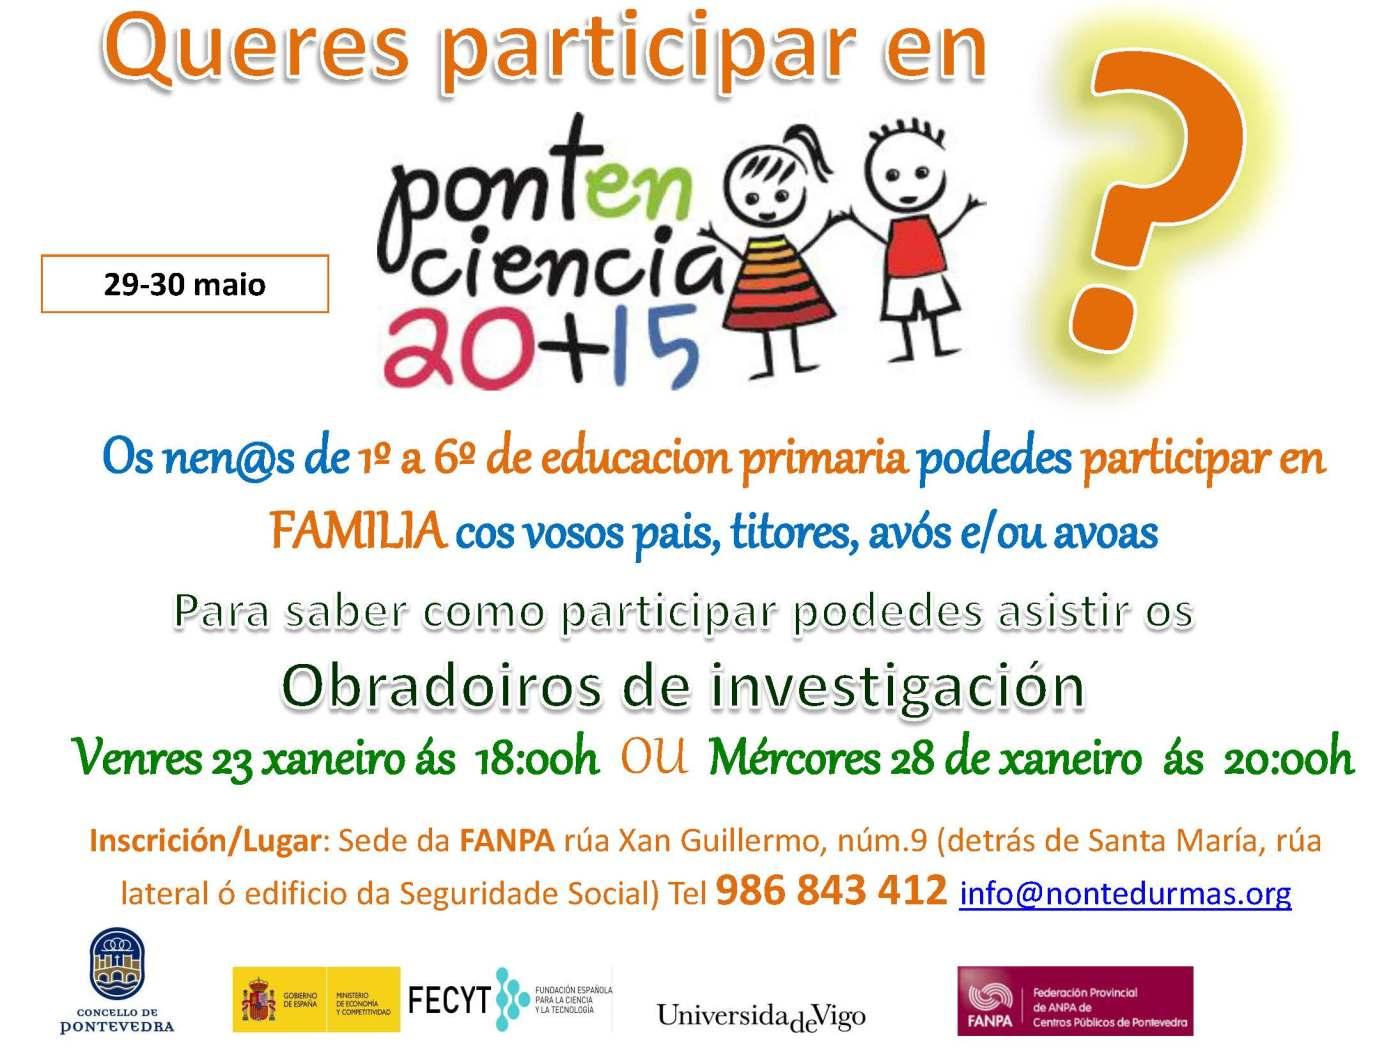 Obradoiros_Ciencia_en_Familia_2015_1_.jpg